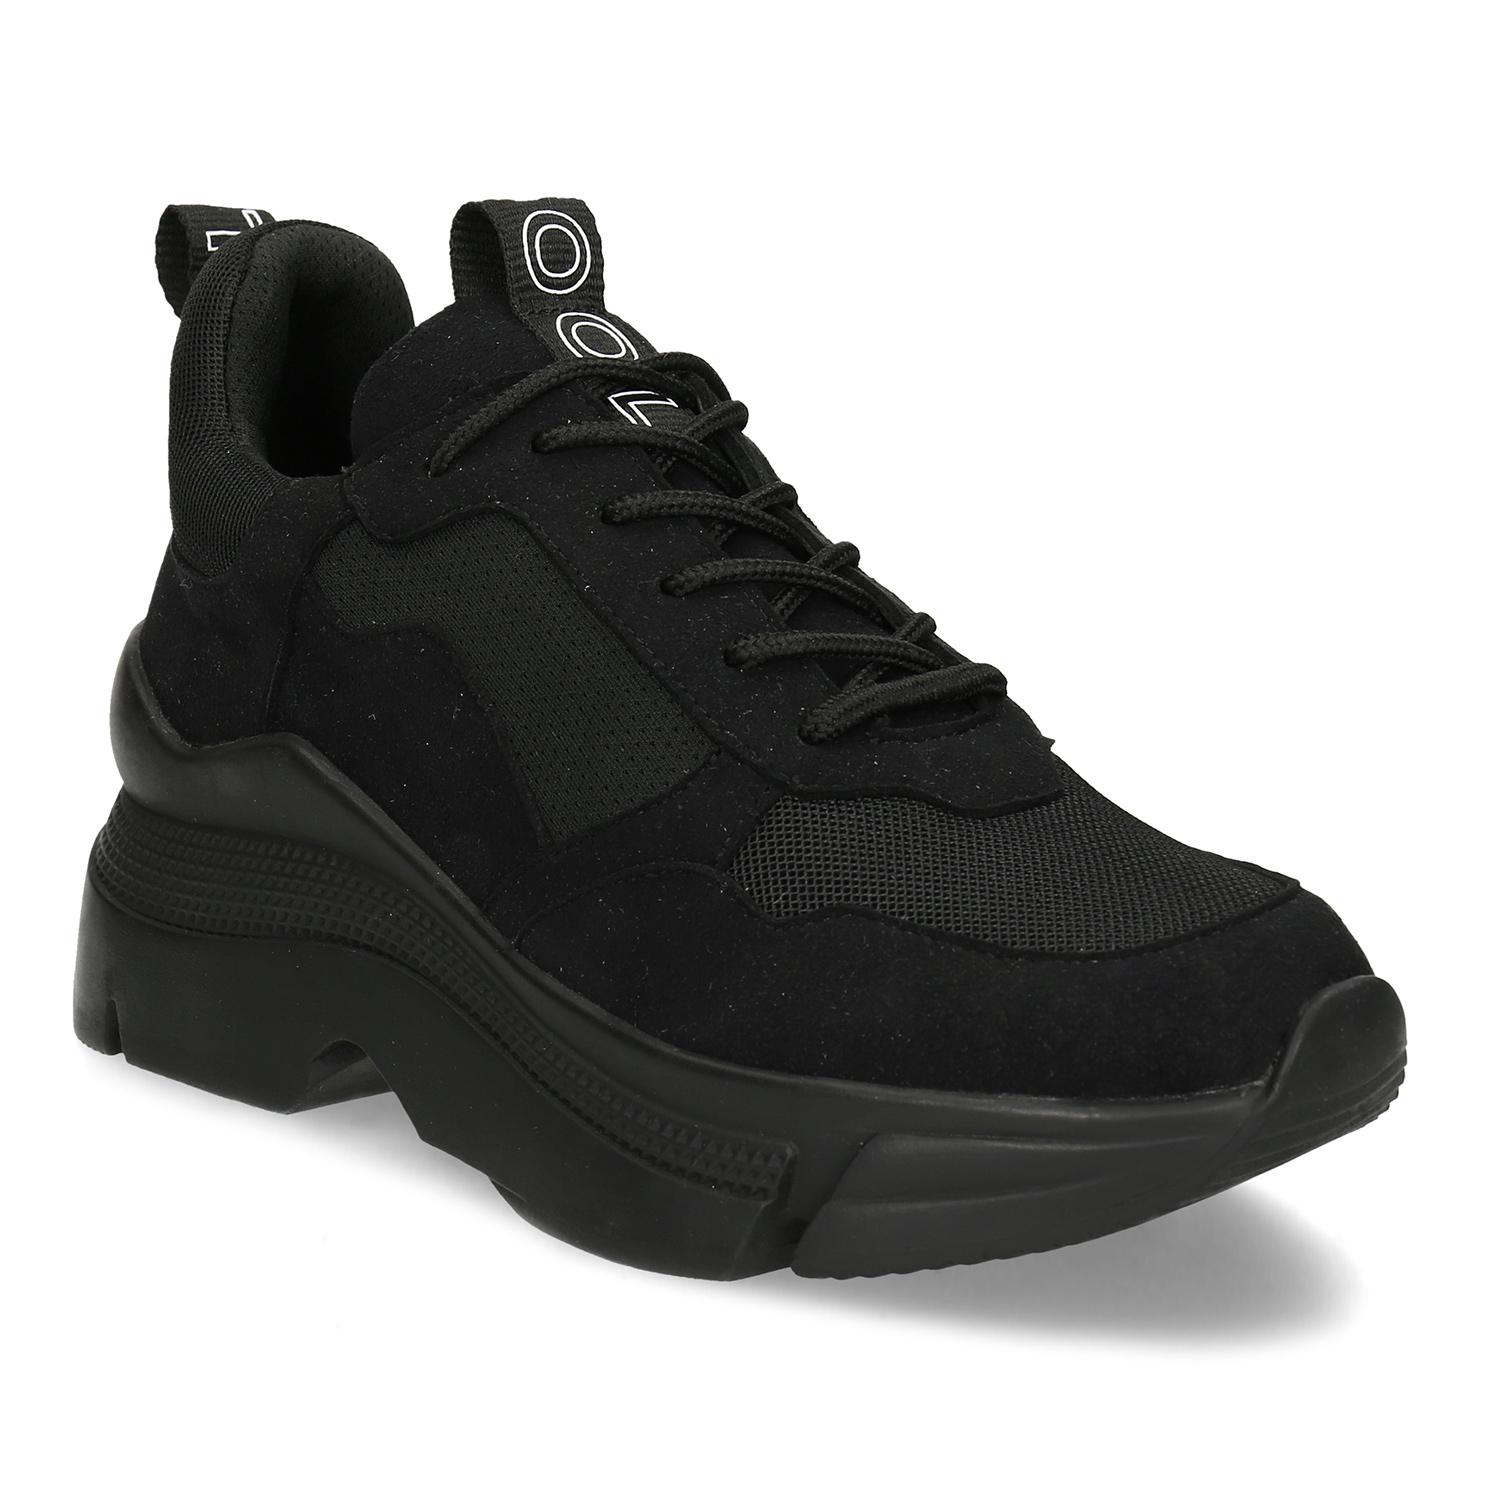 Čierne dámske tenisky v štýle Chunky Sneakers